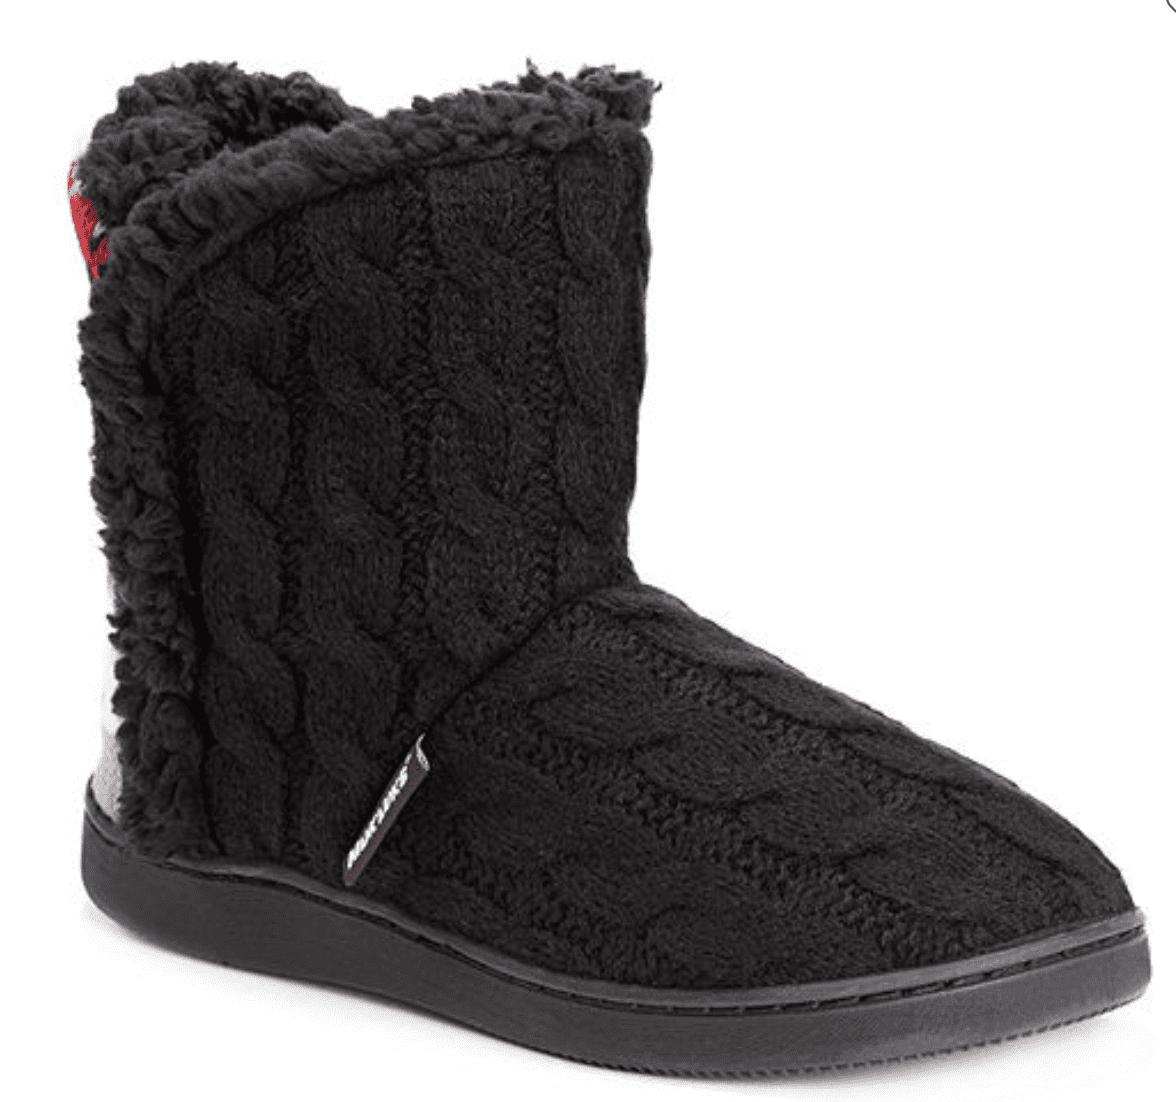 Muk Luk Slippers on sale